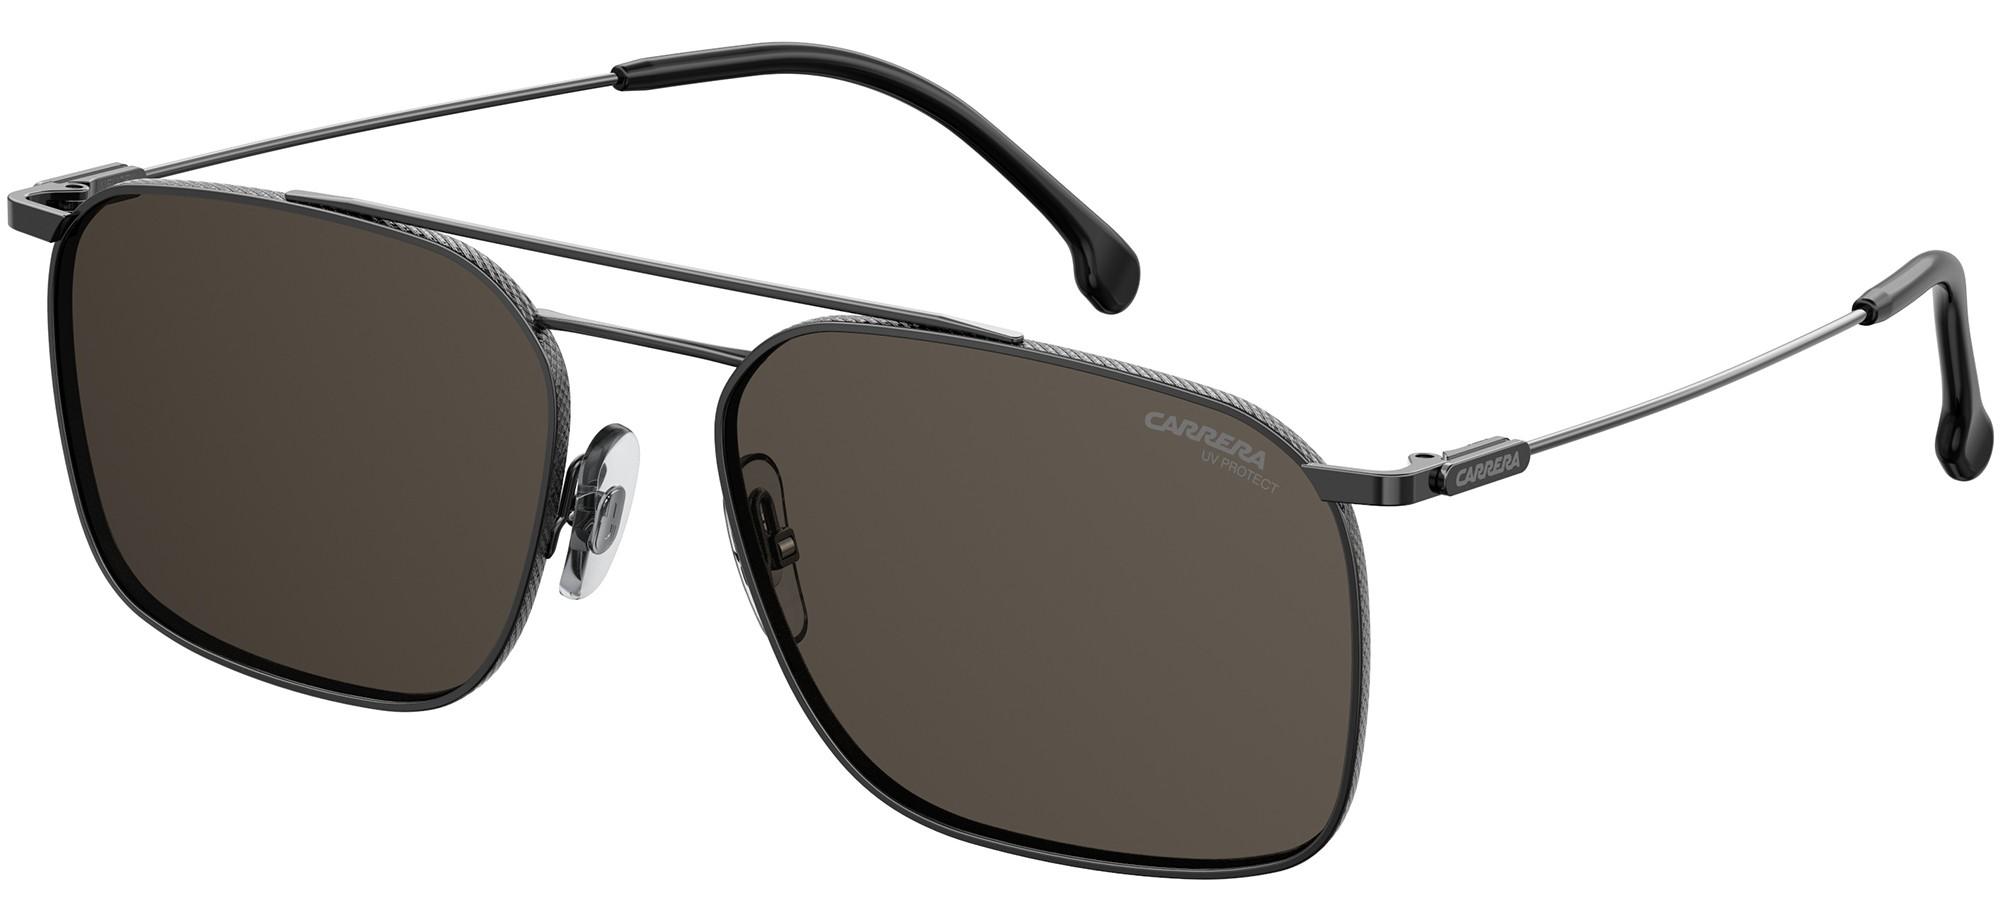 Carrera sunglasses CARRERA 186/S